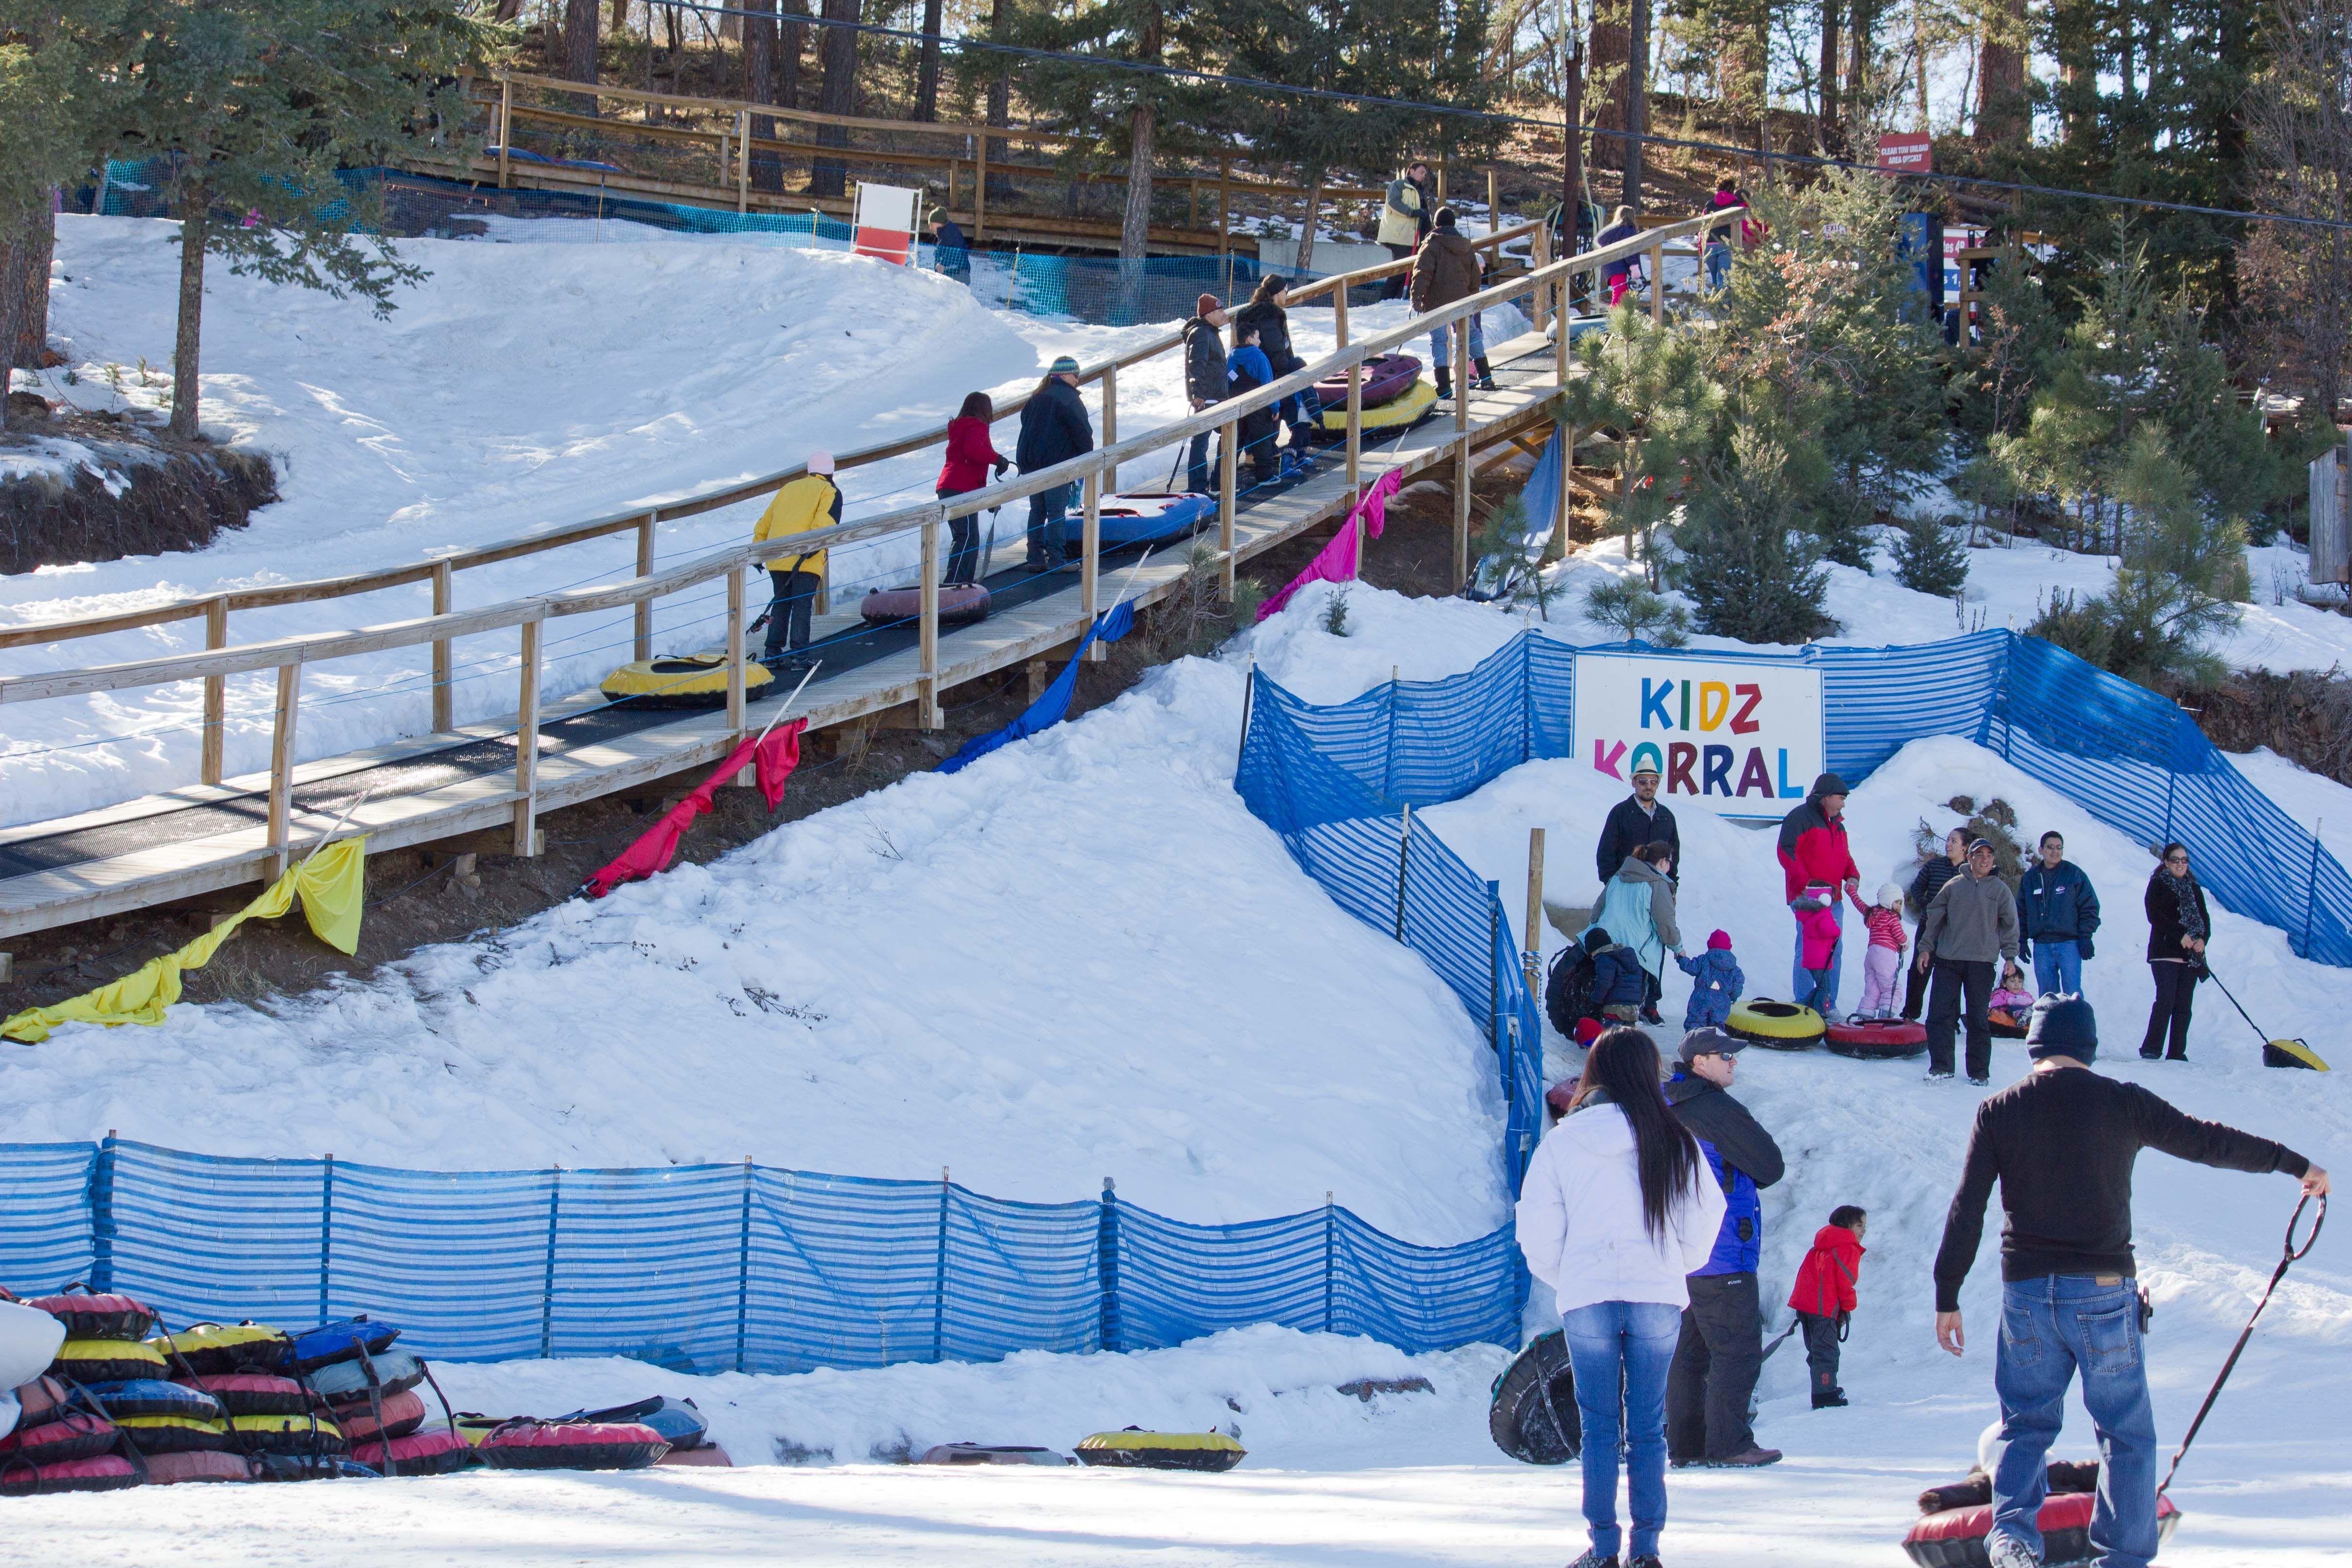 Winter Park Christmas 2020 Ruidoso Winter Park (Alto, NM): Top Tips Before You Go